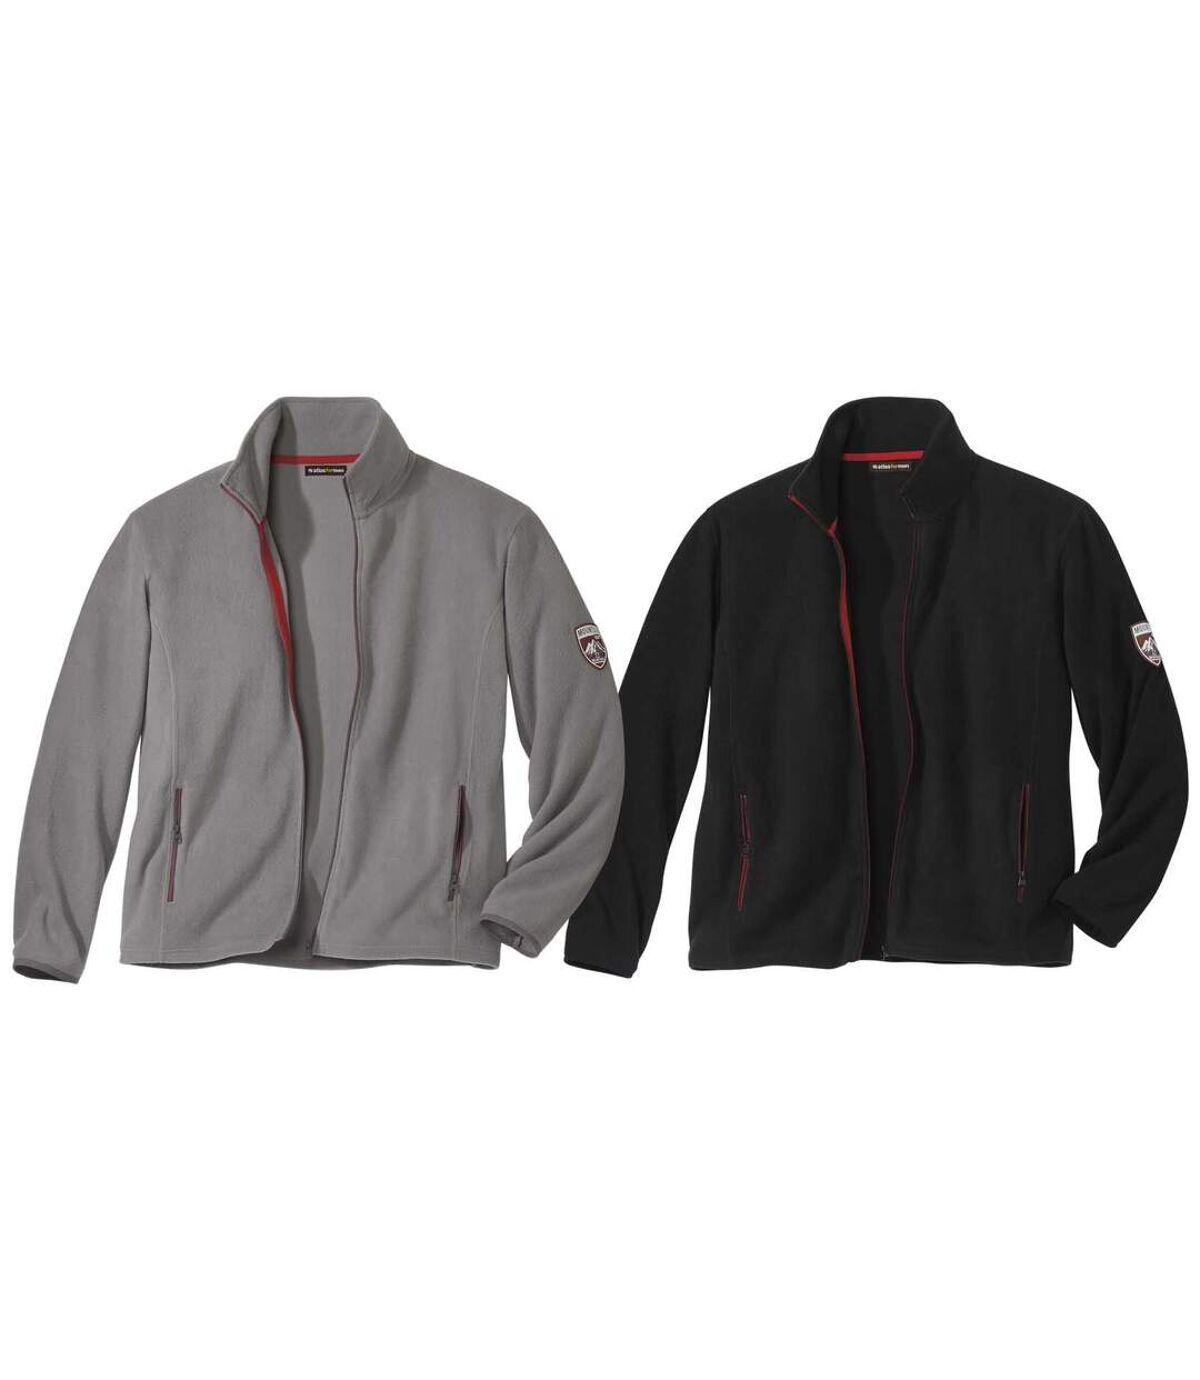 Pack of 2 Microfleece Jackets Atlas For Men